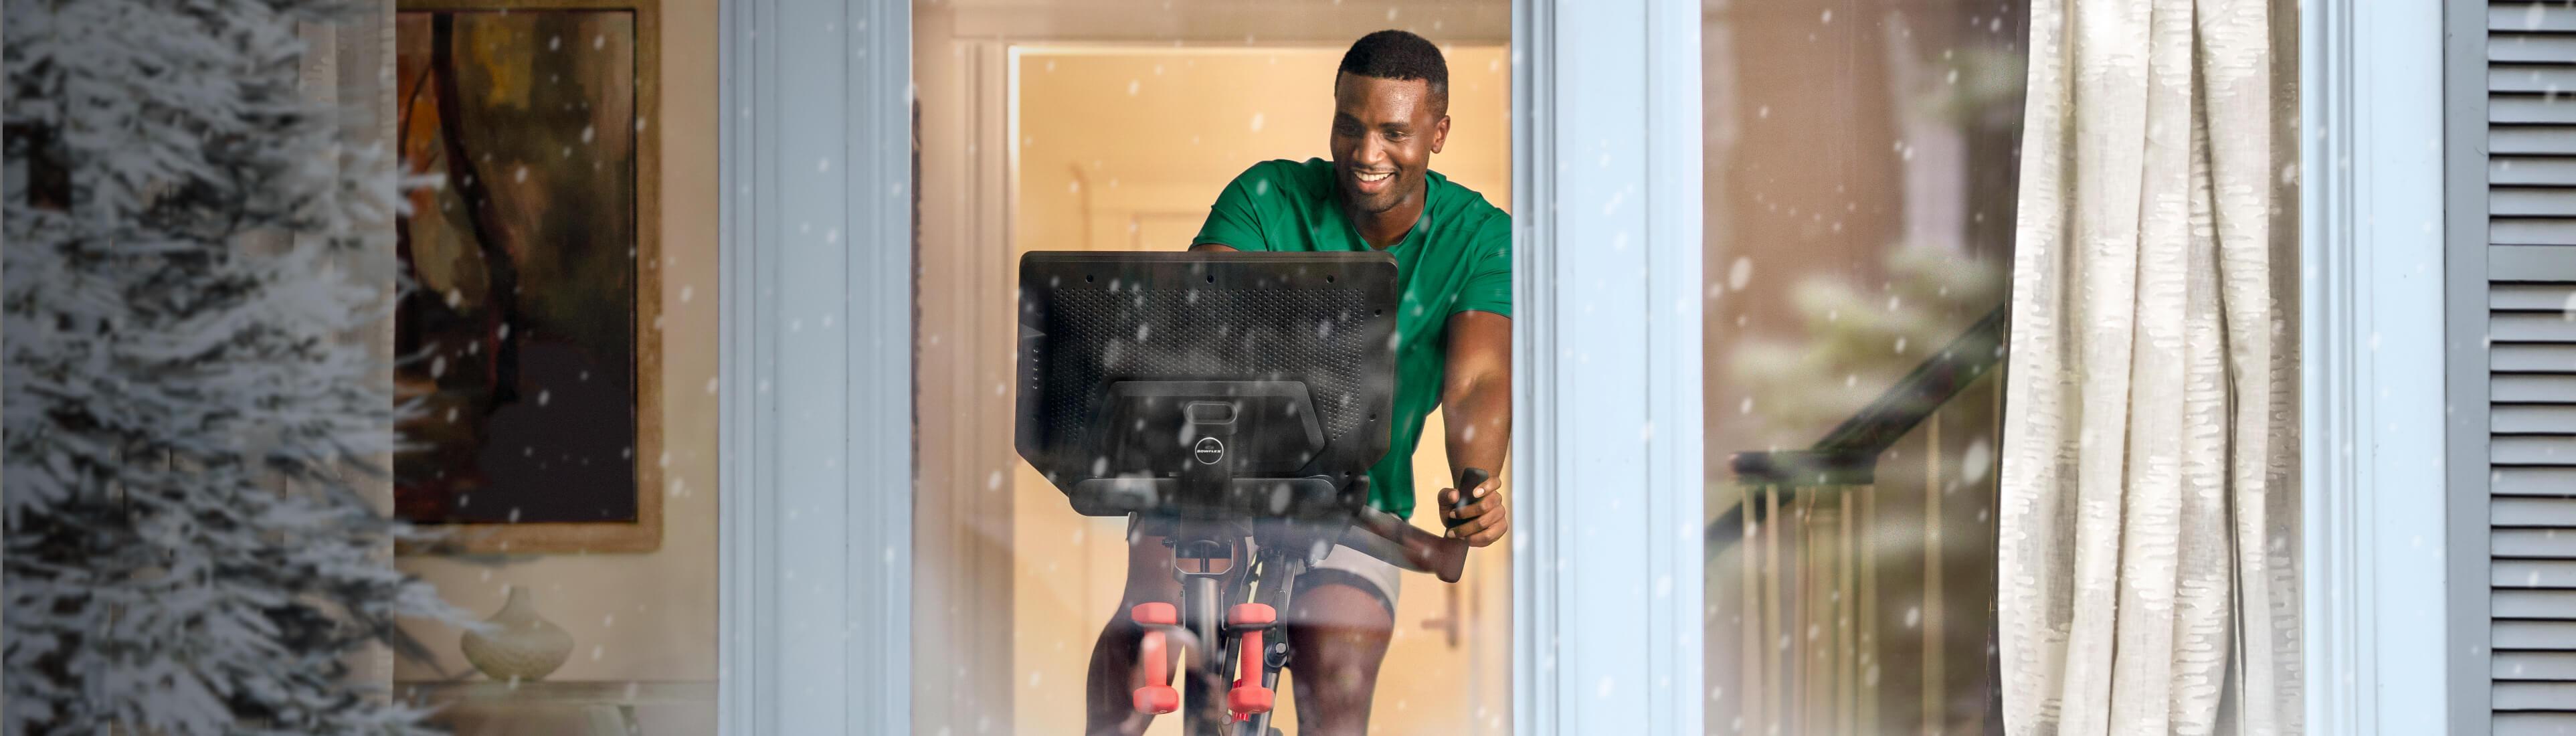 A man riding a VeloCore bike.